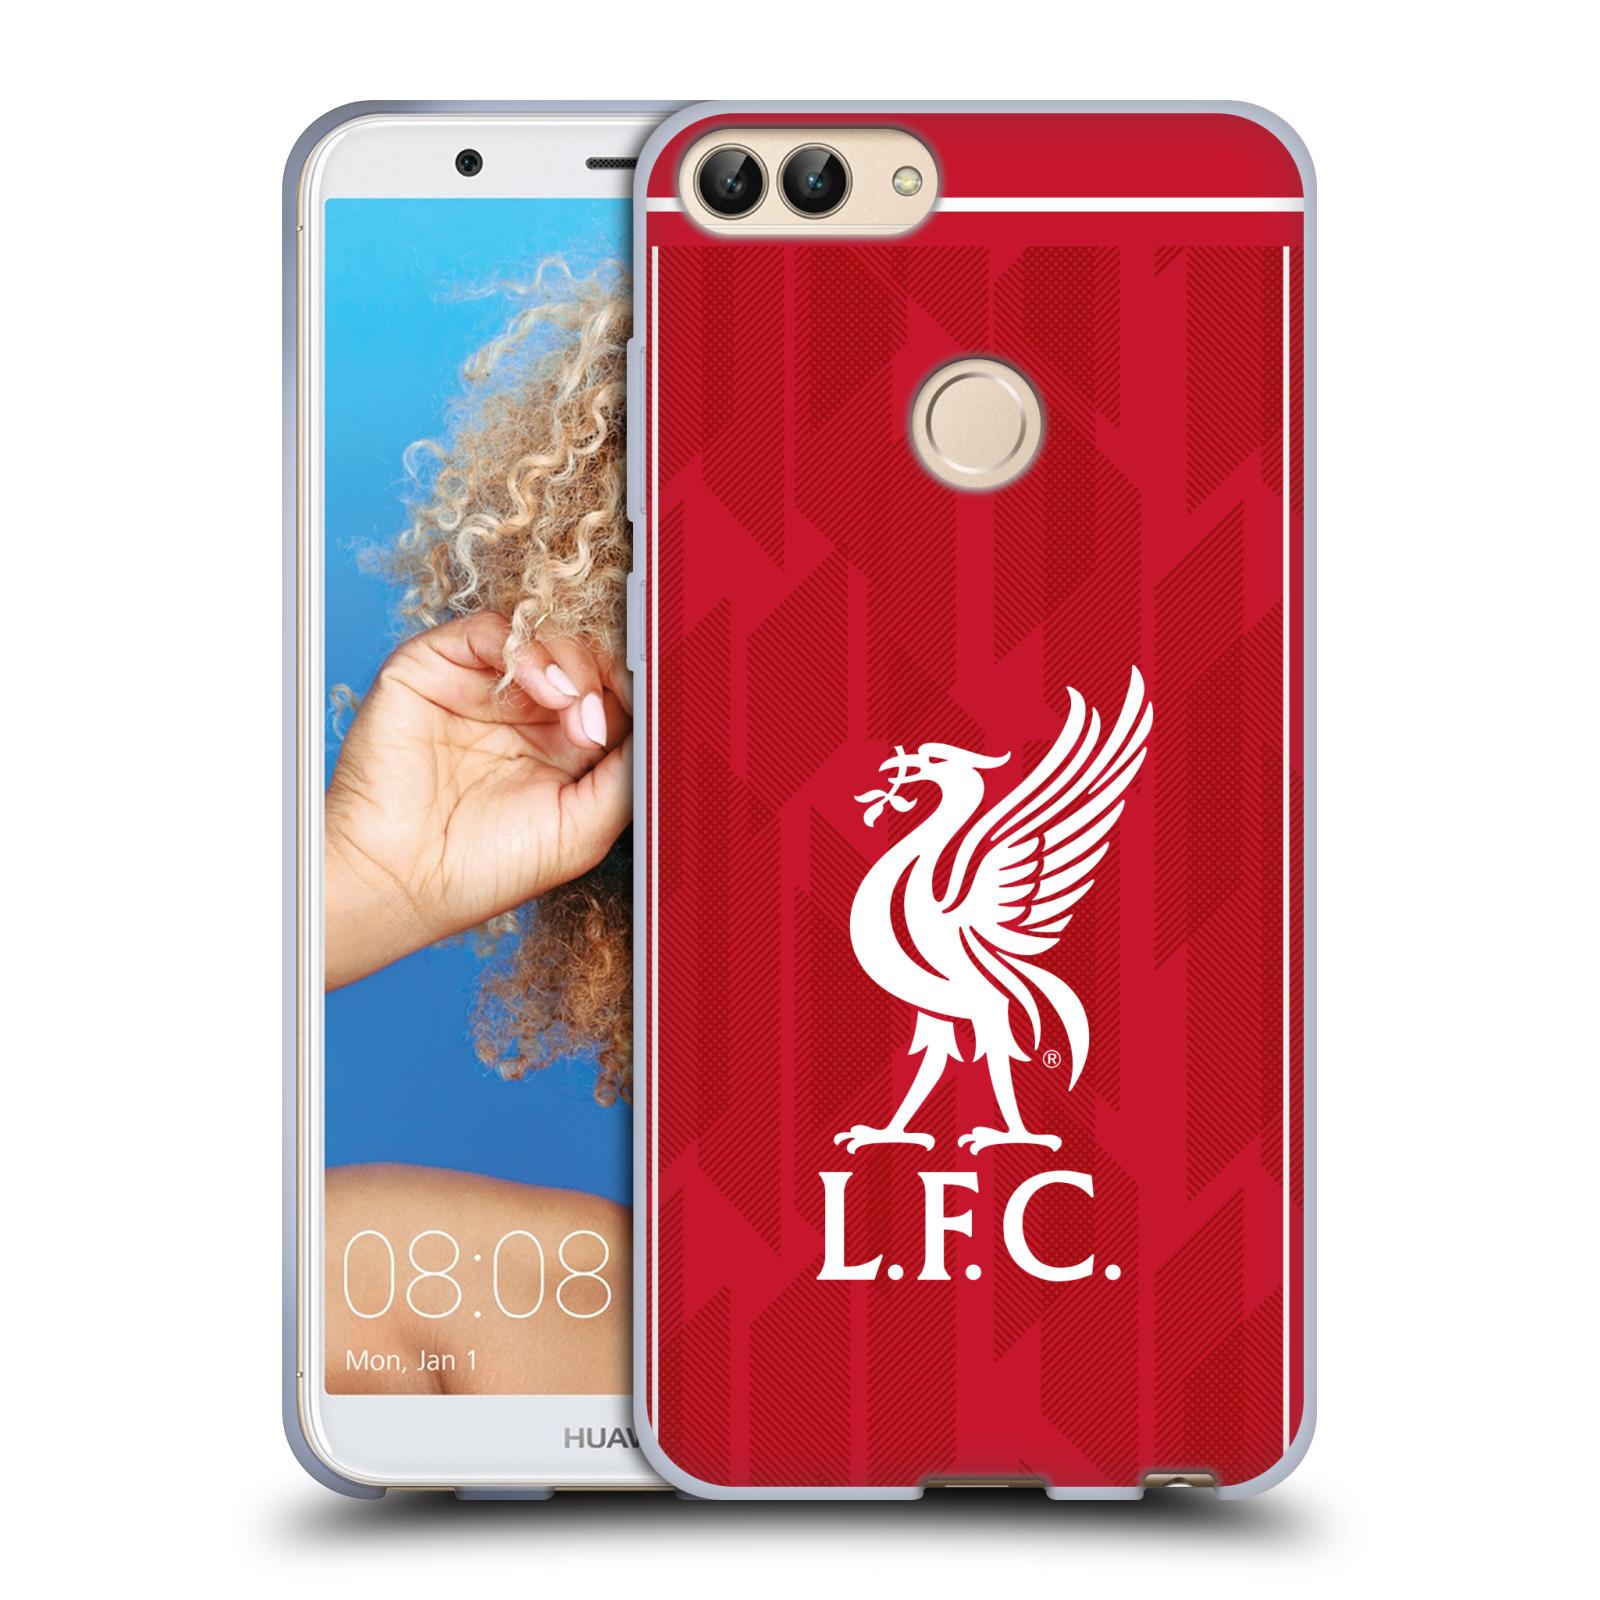 Silikonové pouzdro na mobil Huawei P Smart - Head Case - Liverpool FC - L.F.C. Home kit